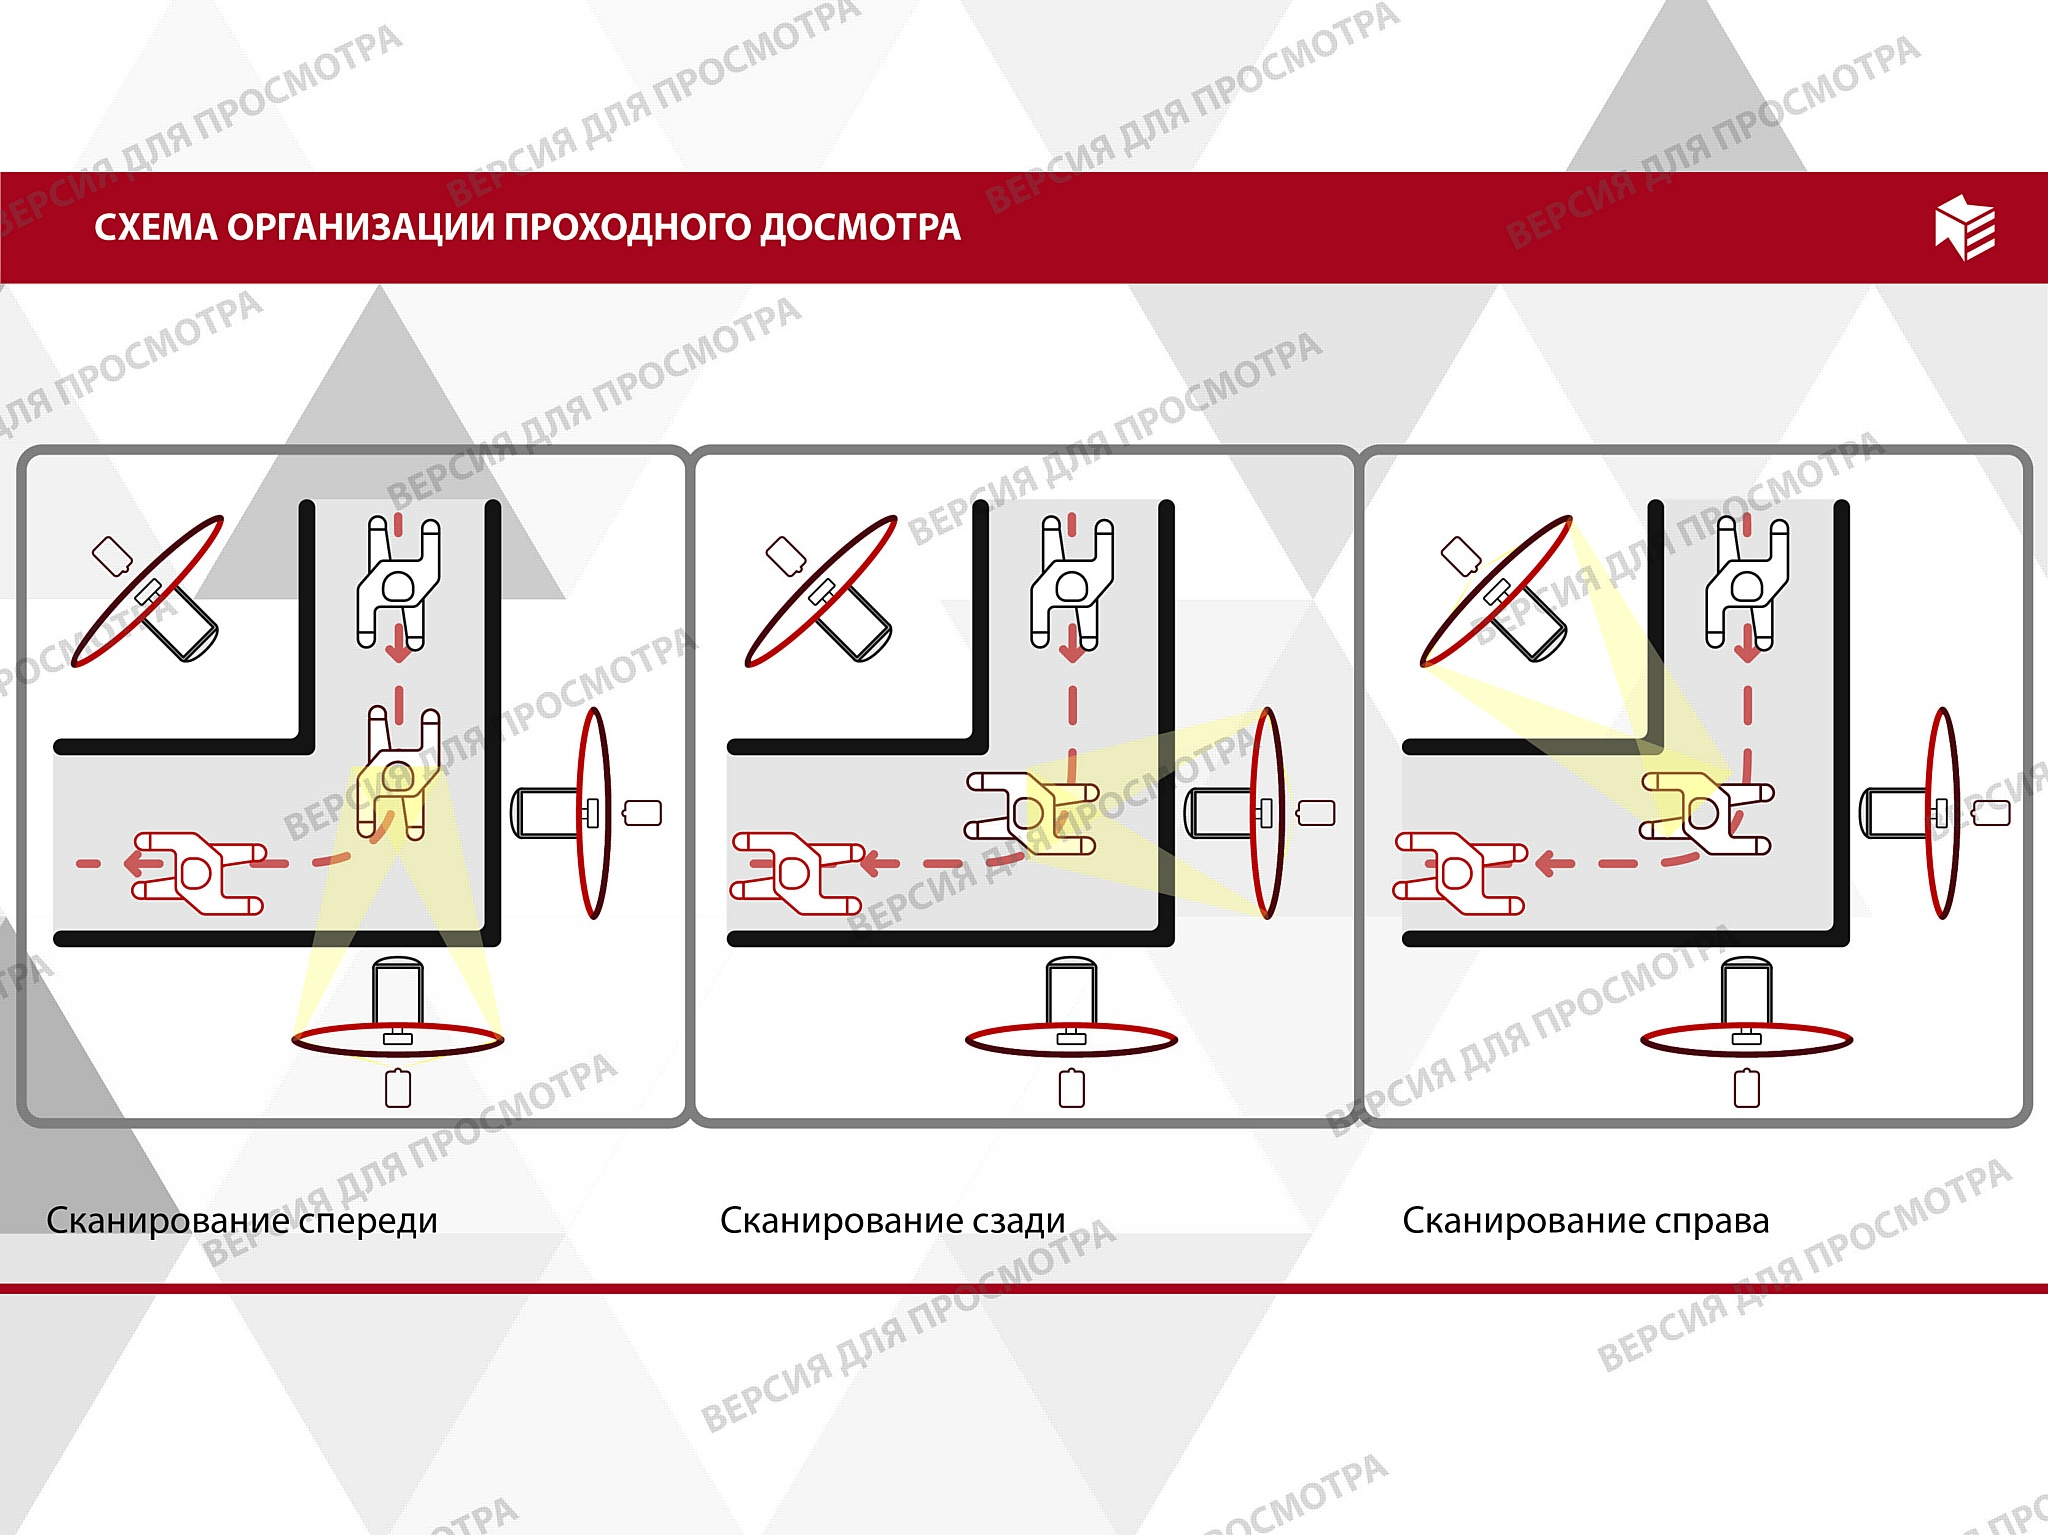 Интервью Василия Эчина: взгляд на будущее индустрии безопасности